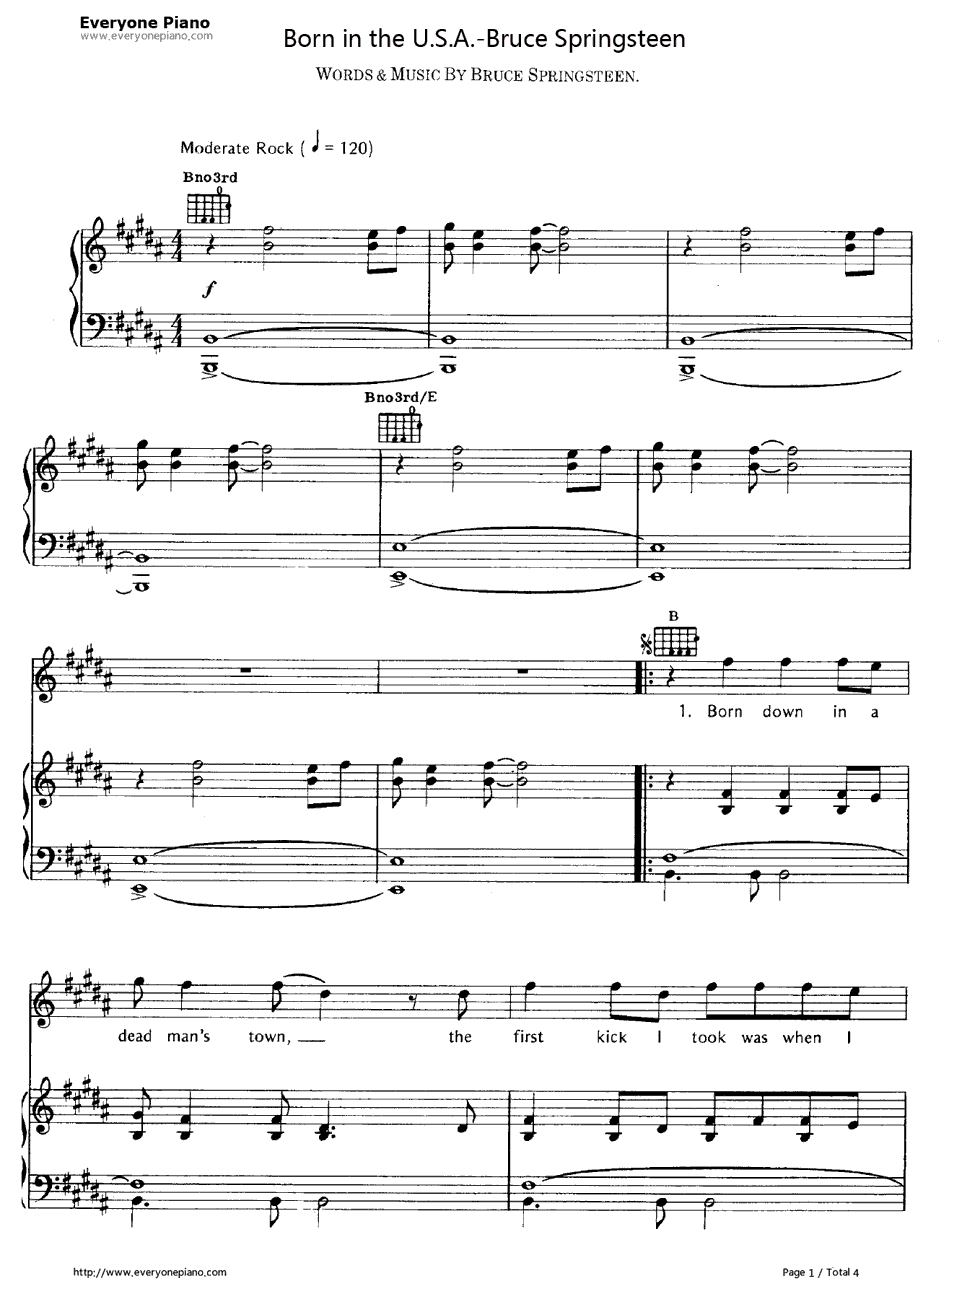 khe sanh piano sheet pdf